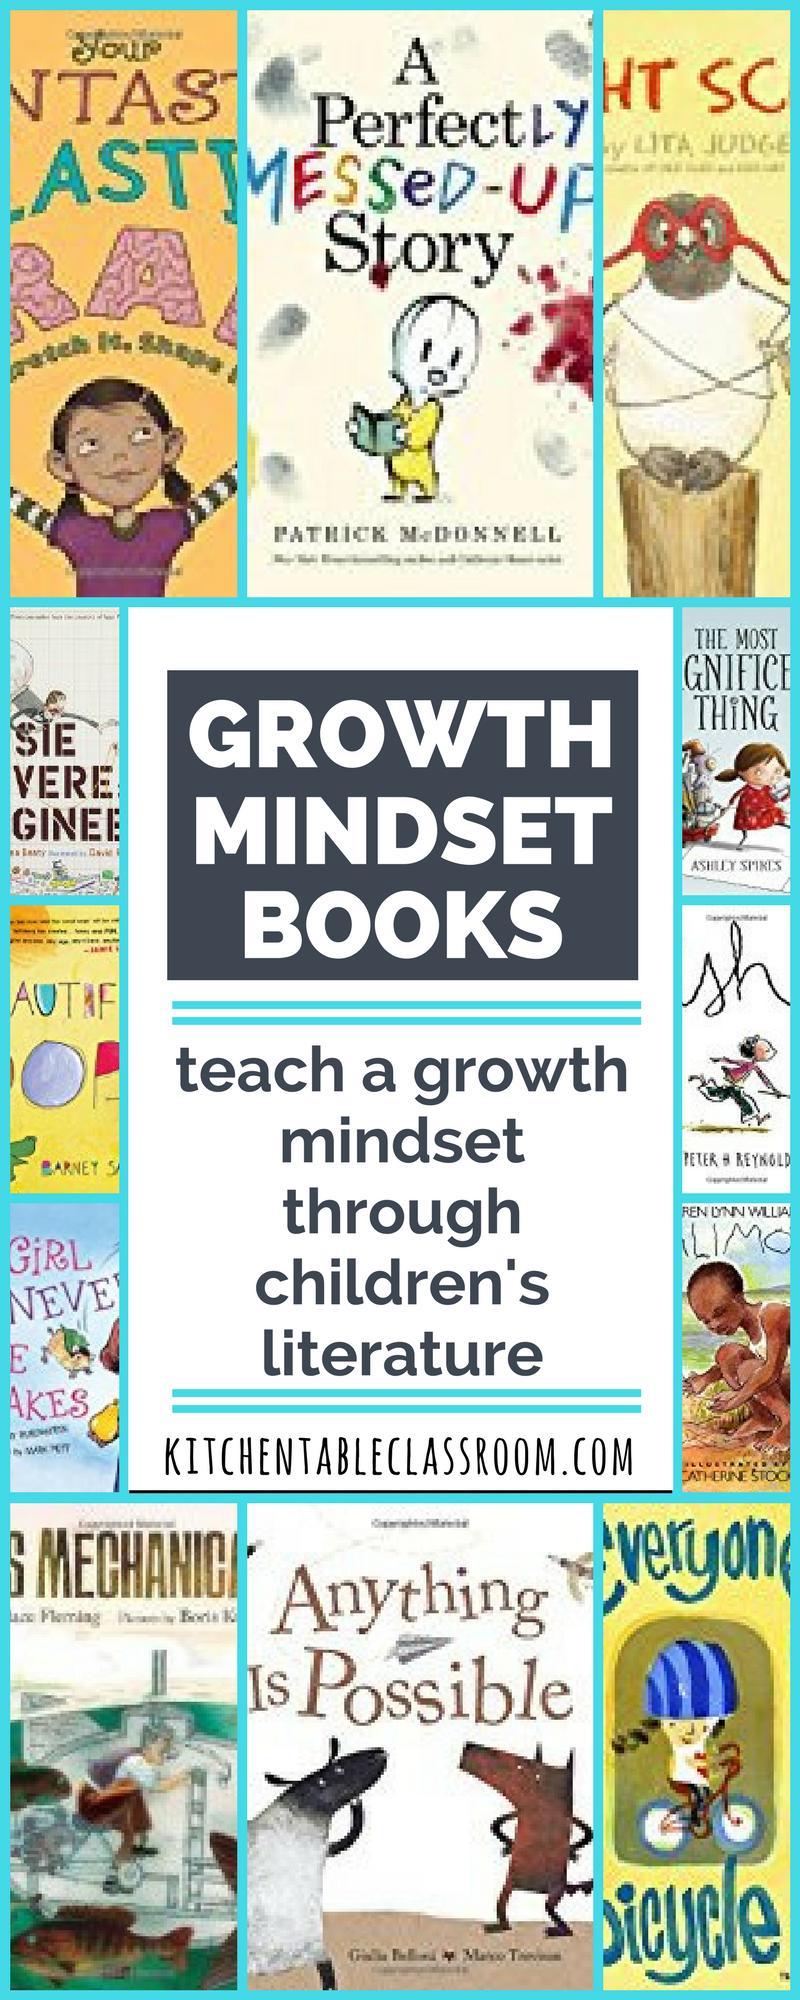 Best Growth Mindset Books for Kids | Mindset, Growth mindset book ...